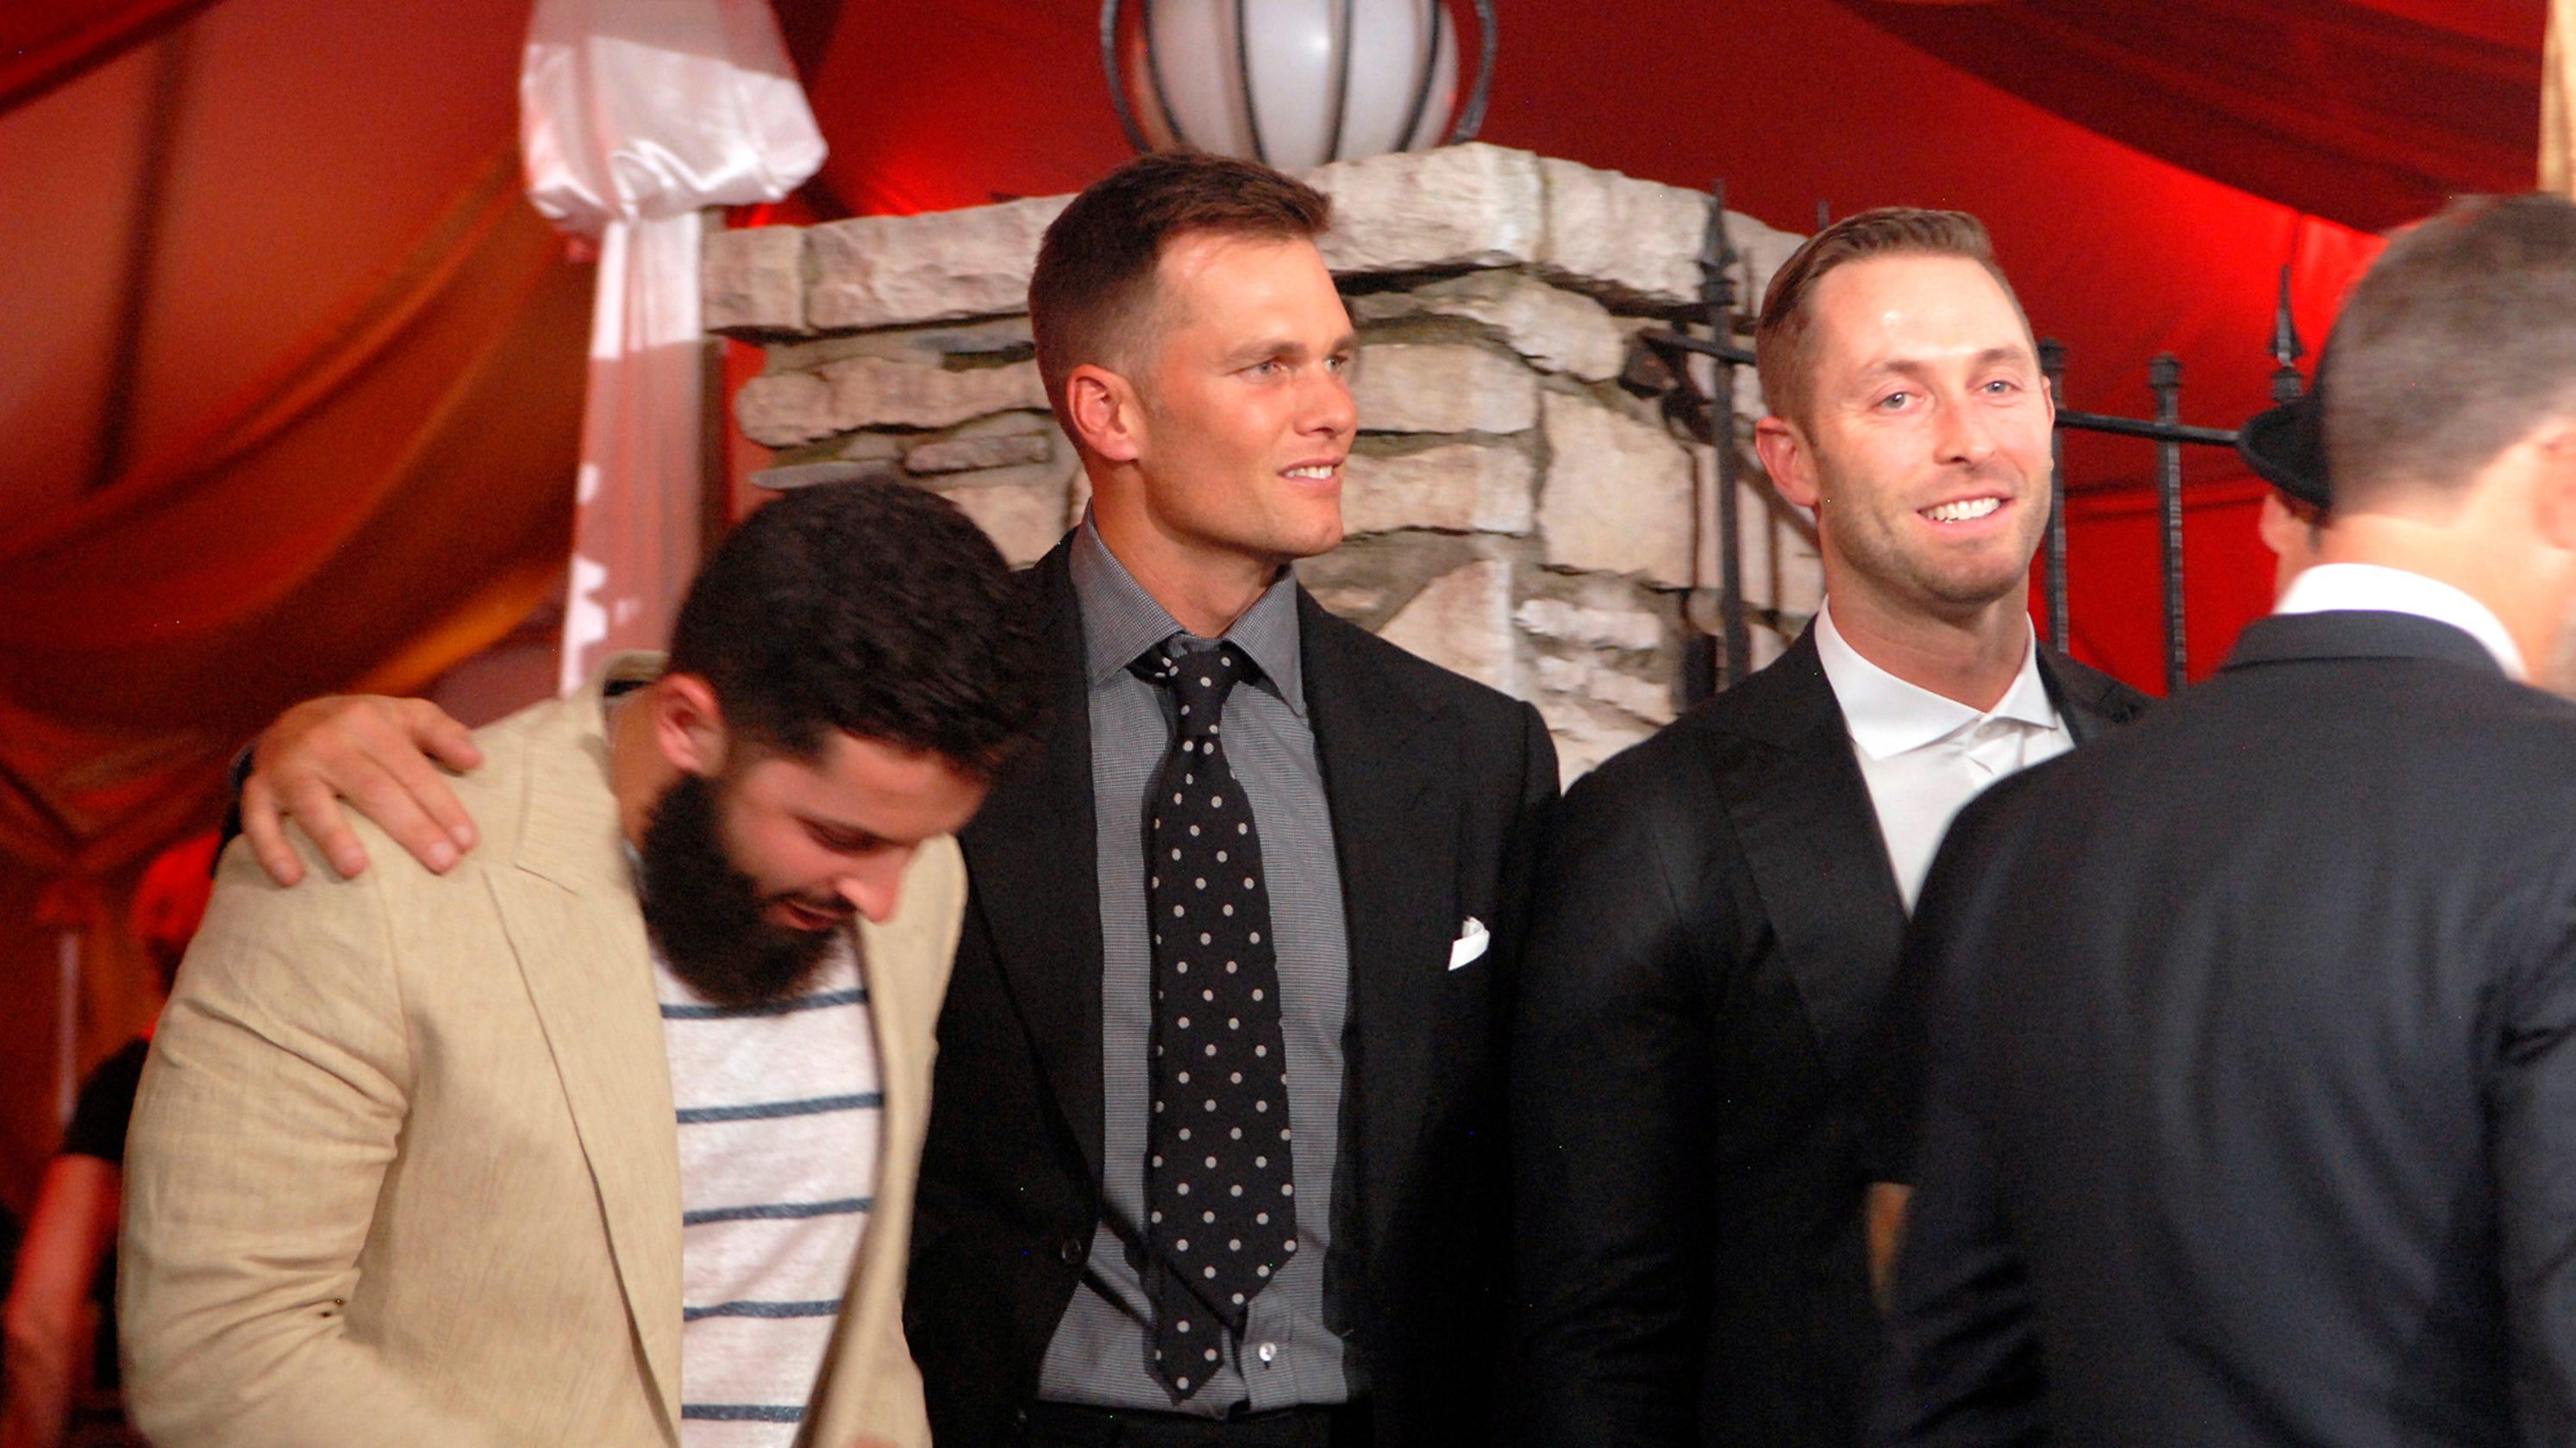 Kentucky Derby: Tom Brady made a $100K bet with Danny Amendola